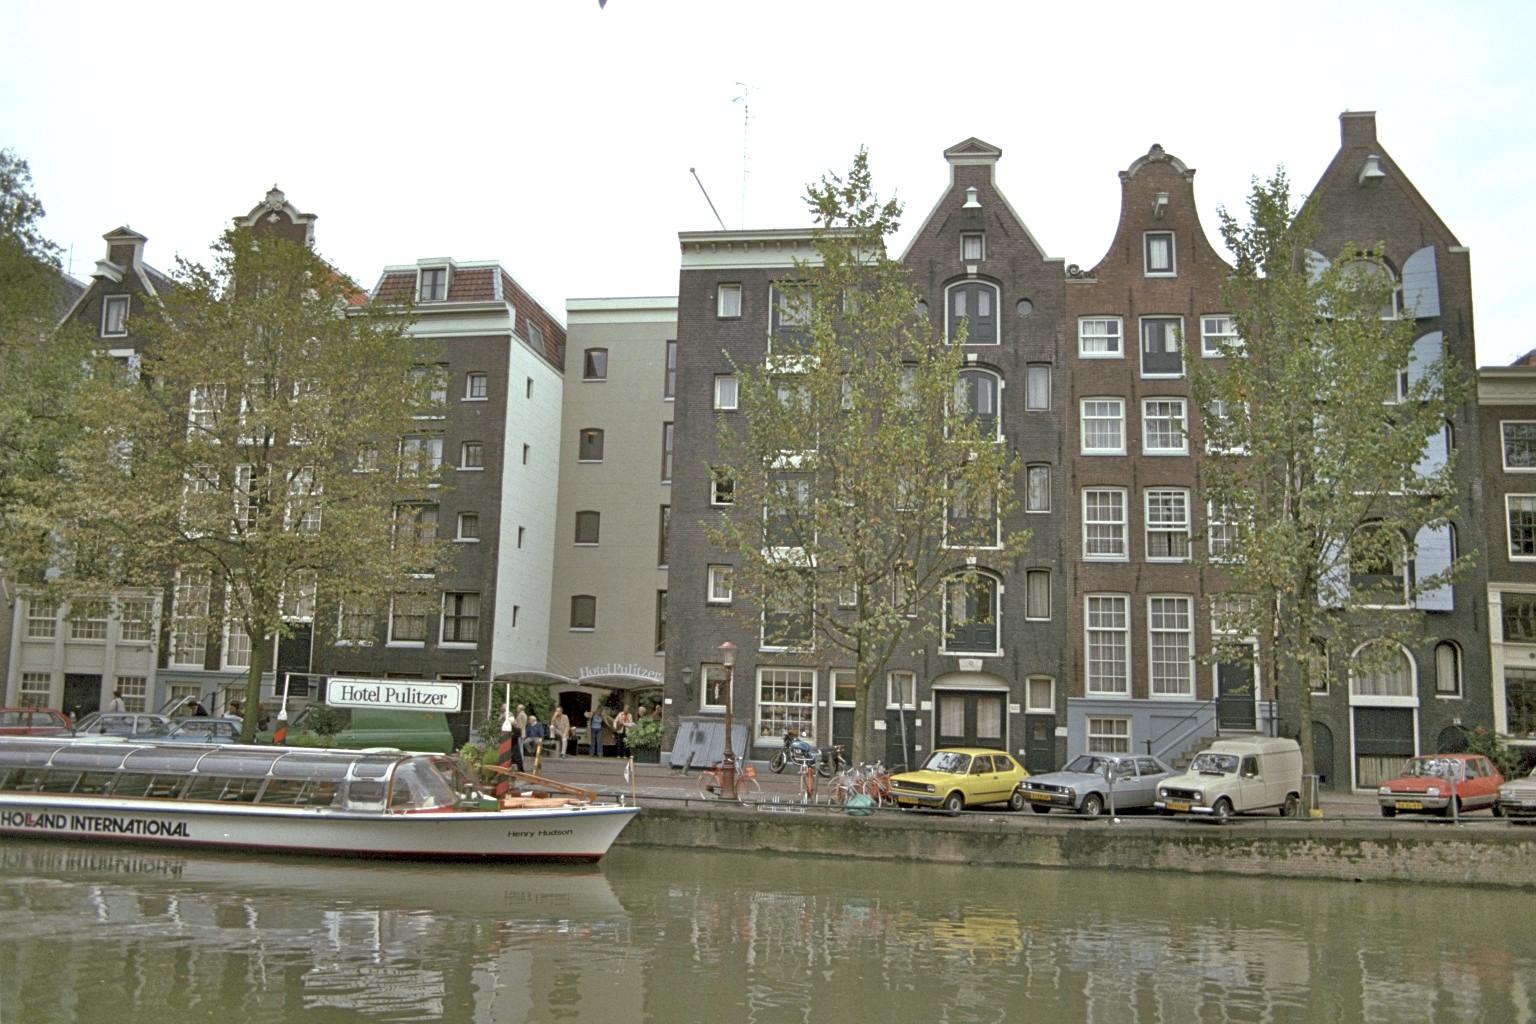 Pulitzer hotel, Amsterdam 2